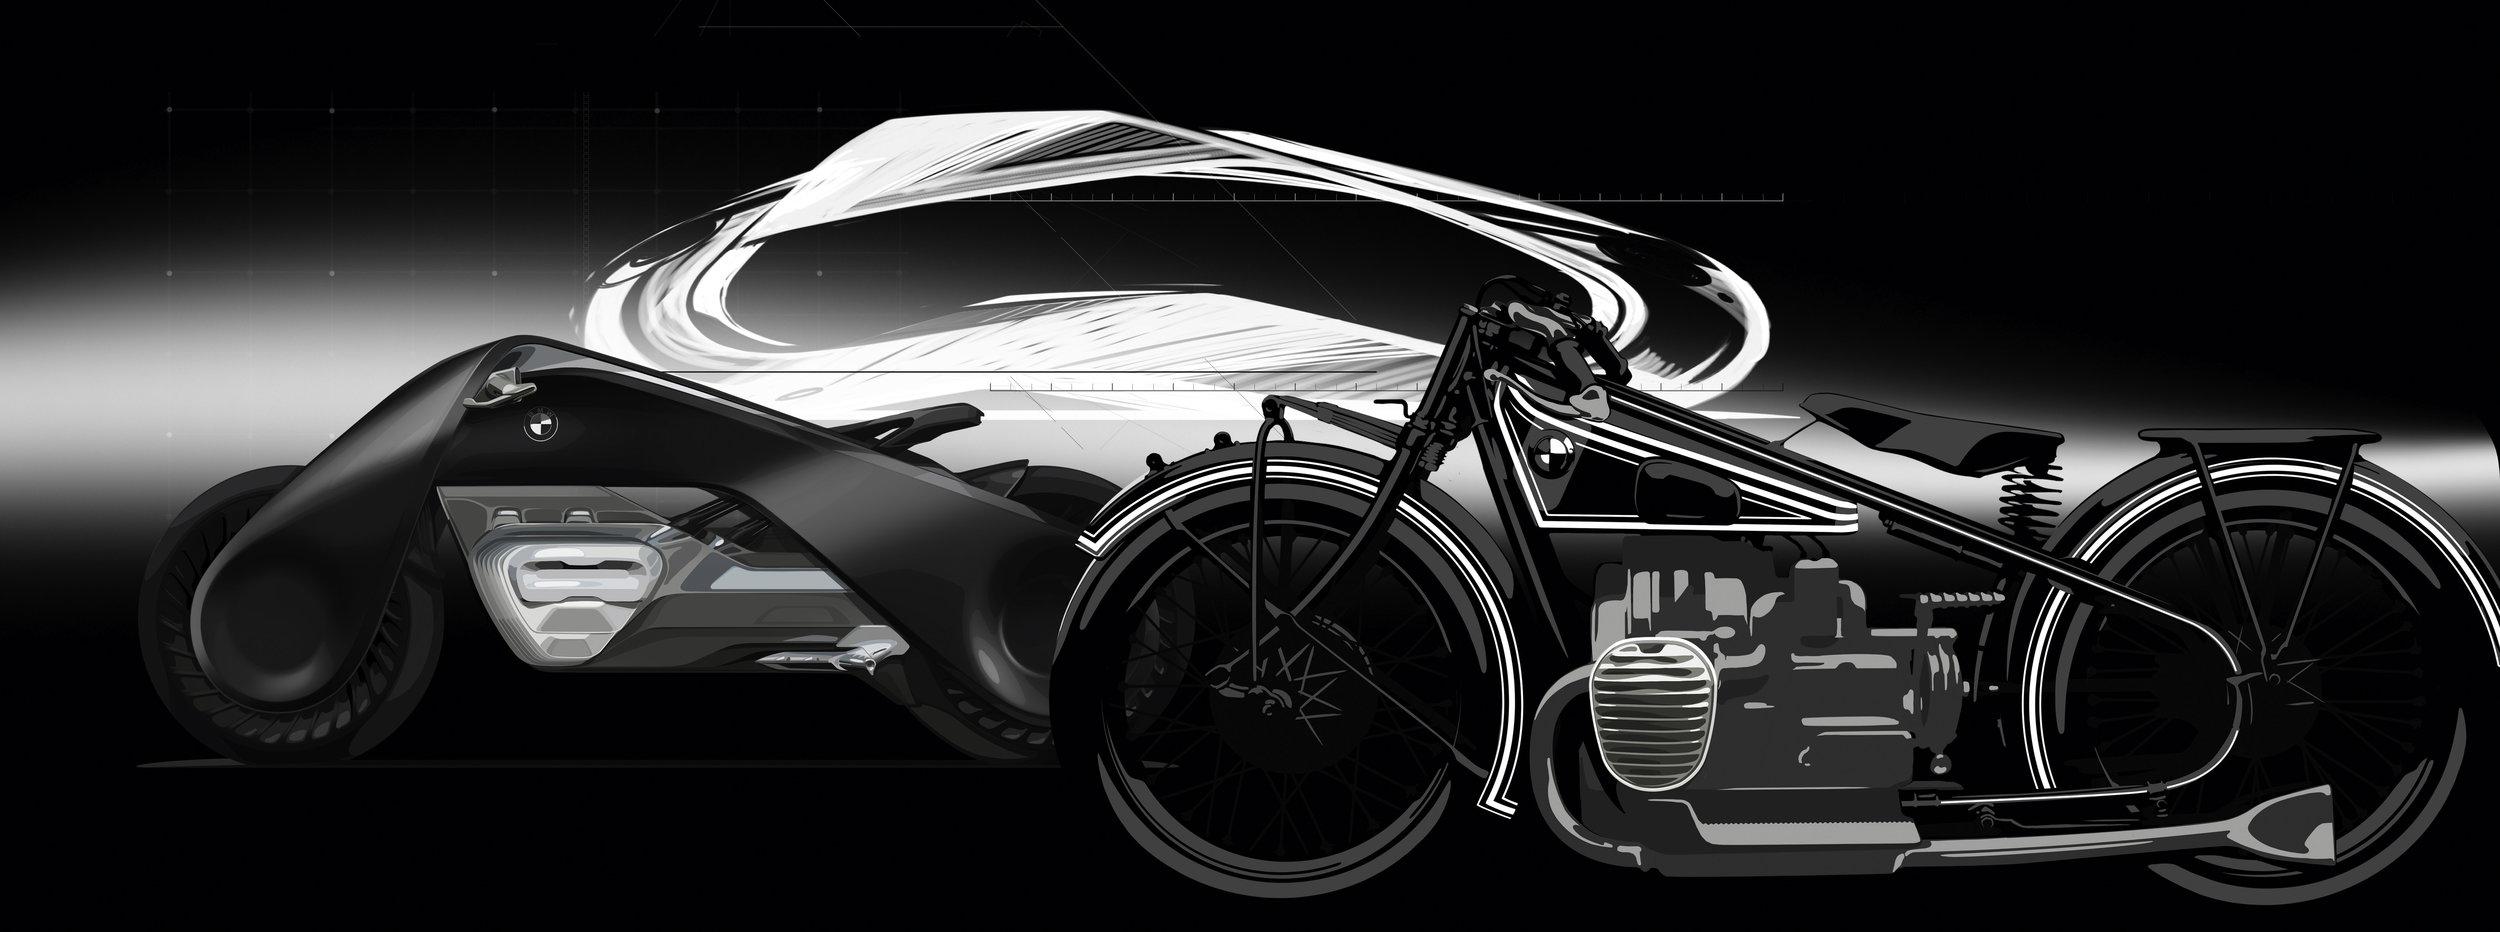 P90238738_highRes_sketch-bmw-motorrad-.jpg